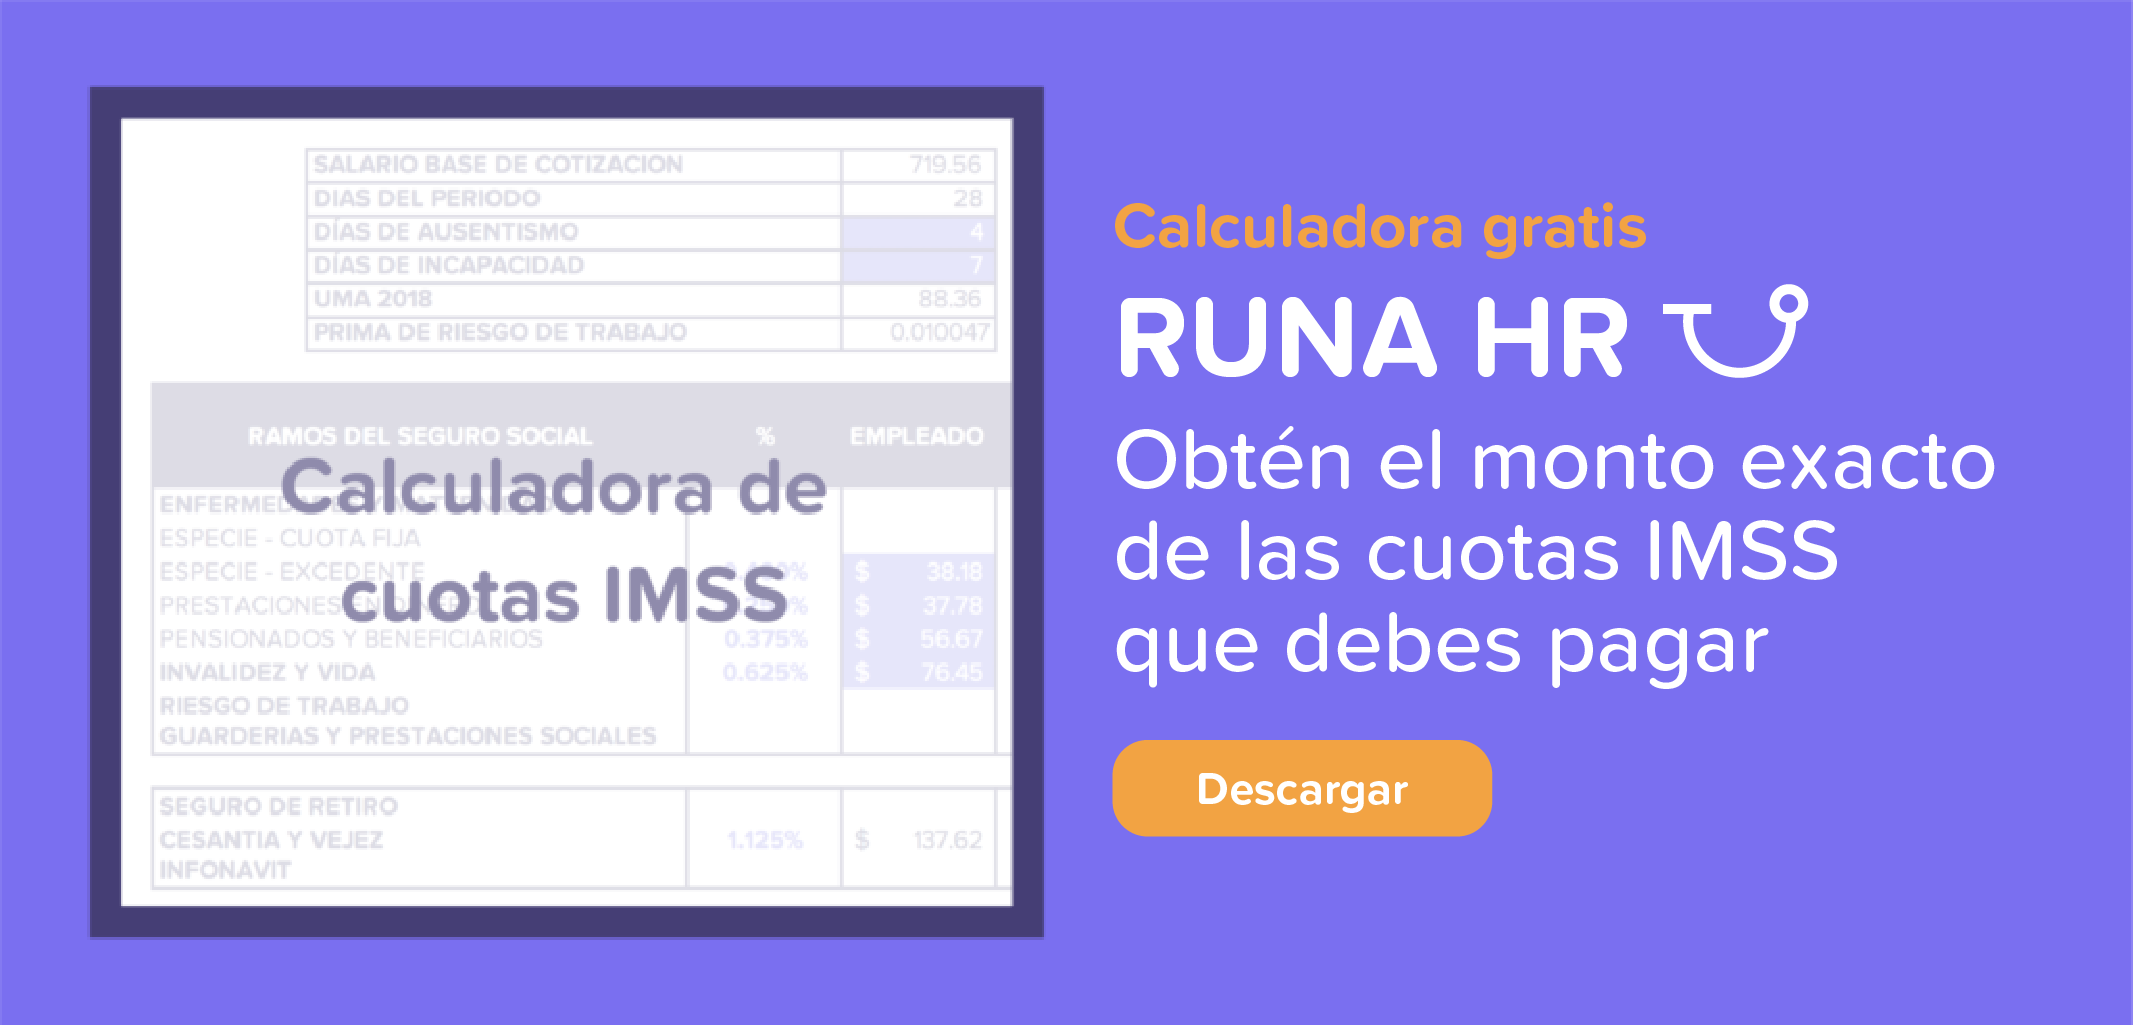 Calculadora de Cuotas IMSS INFONAVIT | Runa HR